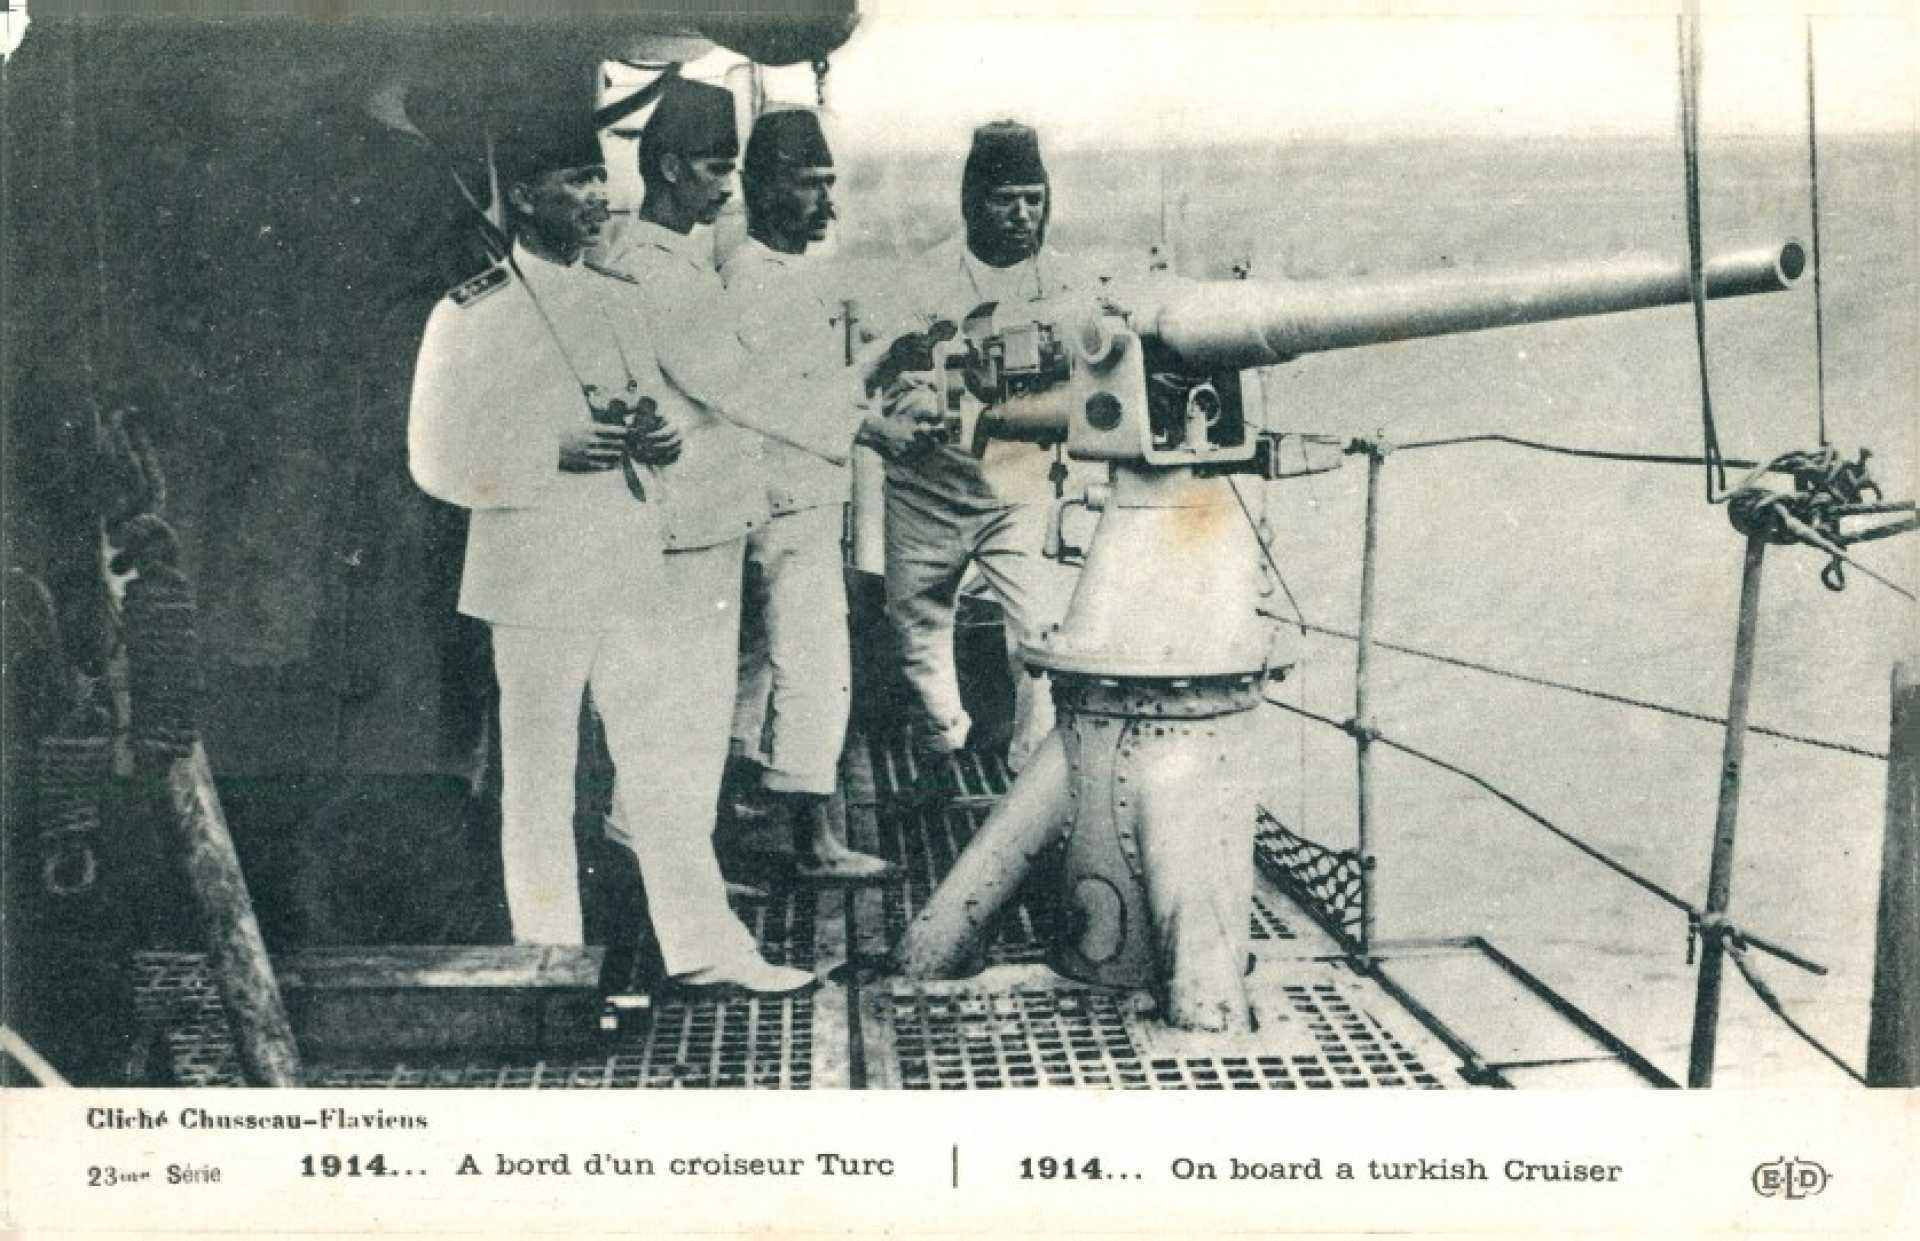 Cliche Chusscau – Flaviens  1914